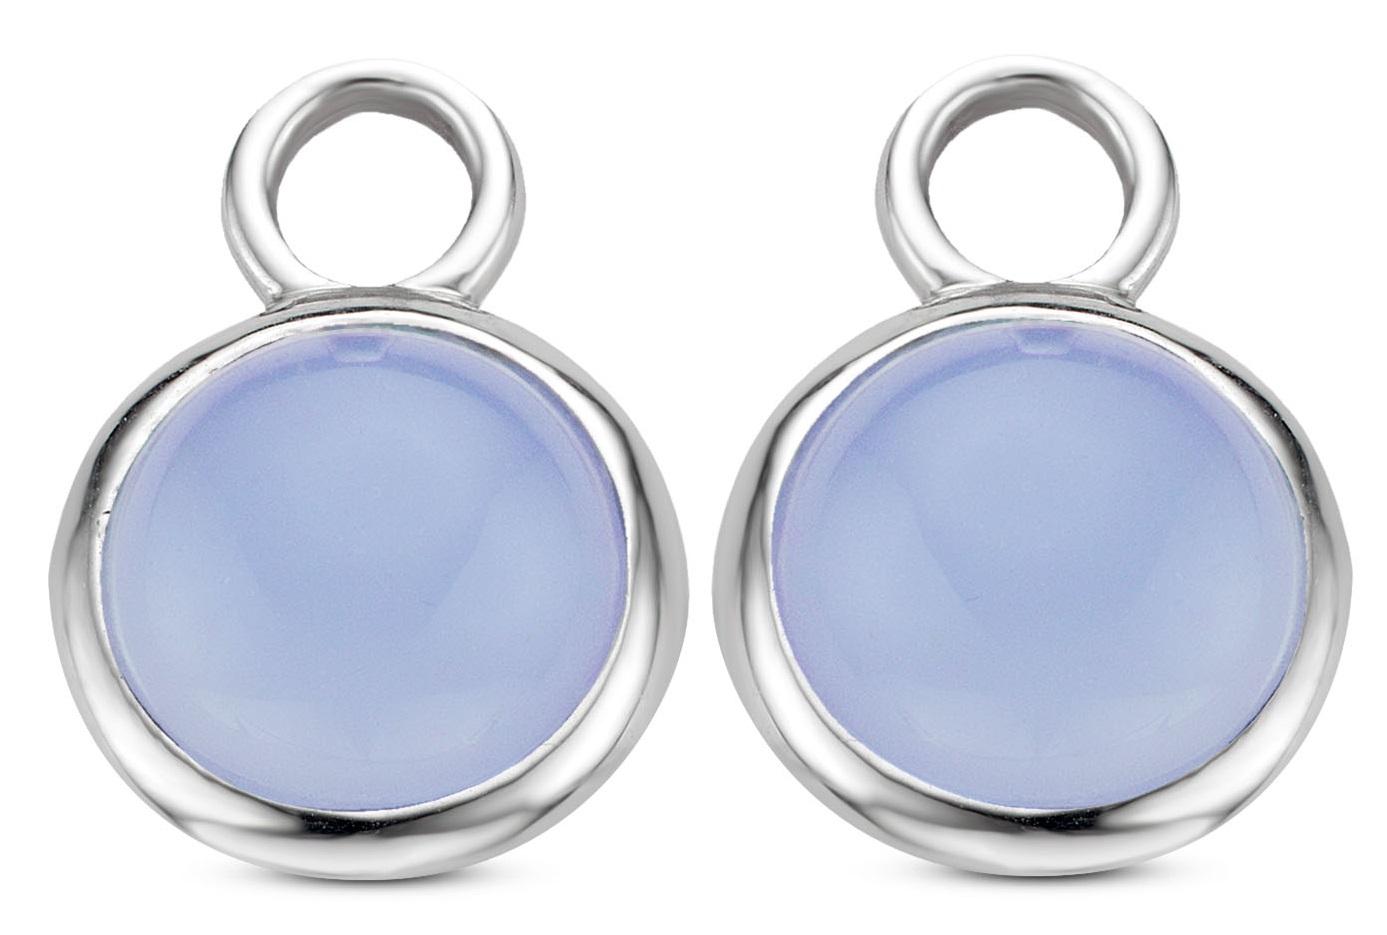 ti sento earring charms 9167la buy online